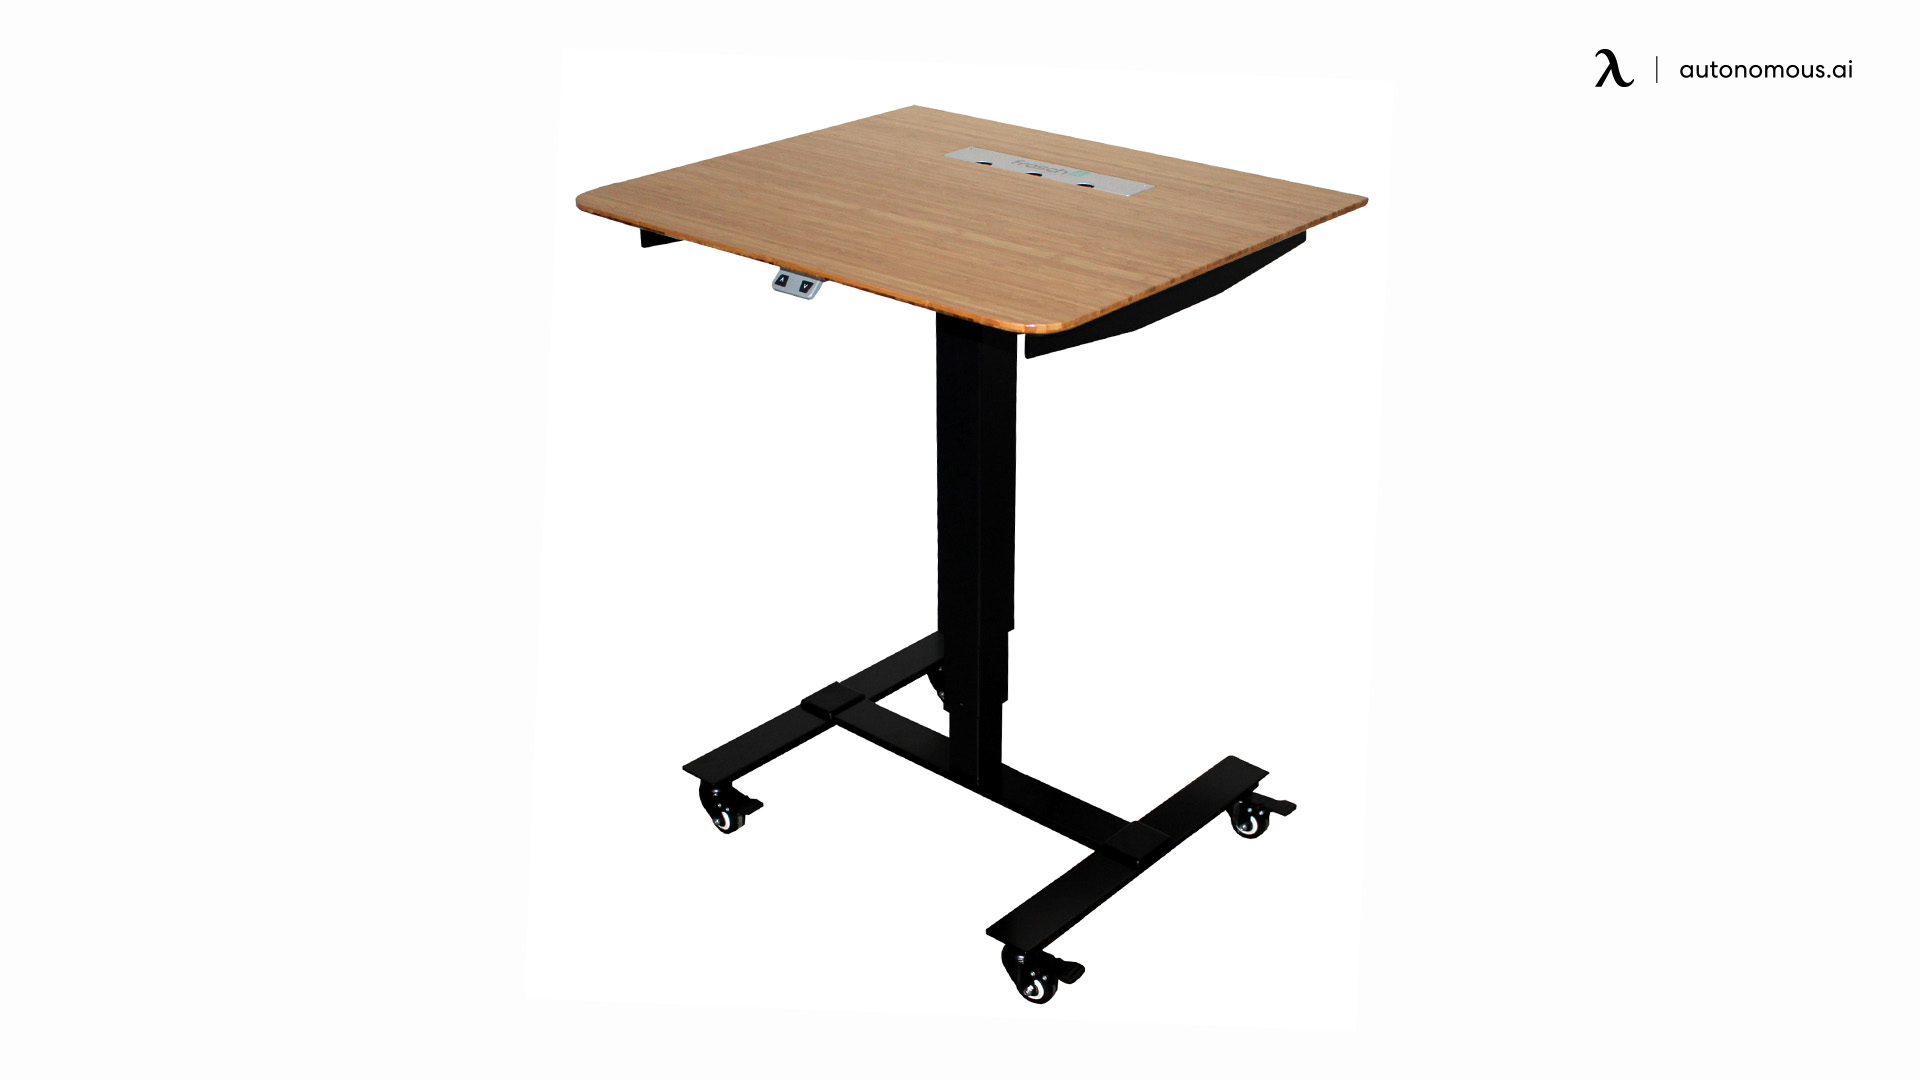 Bamboo Adjustable Desk by Frasch